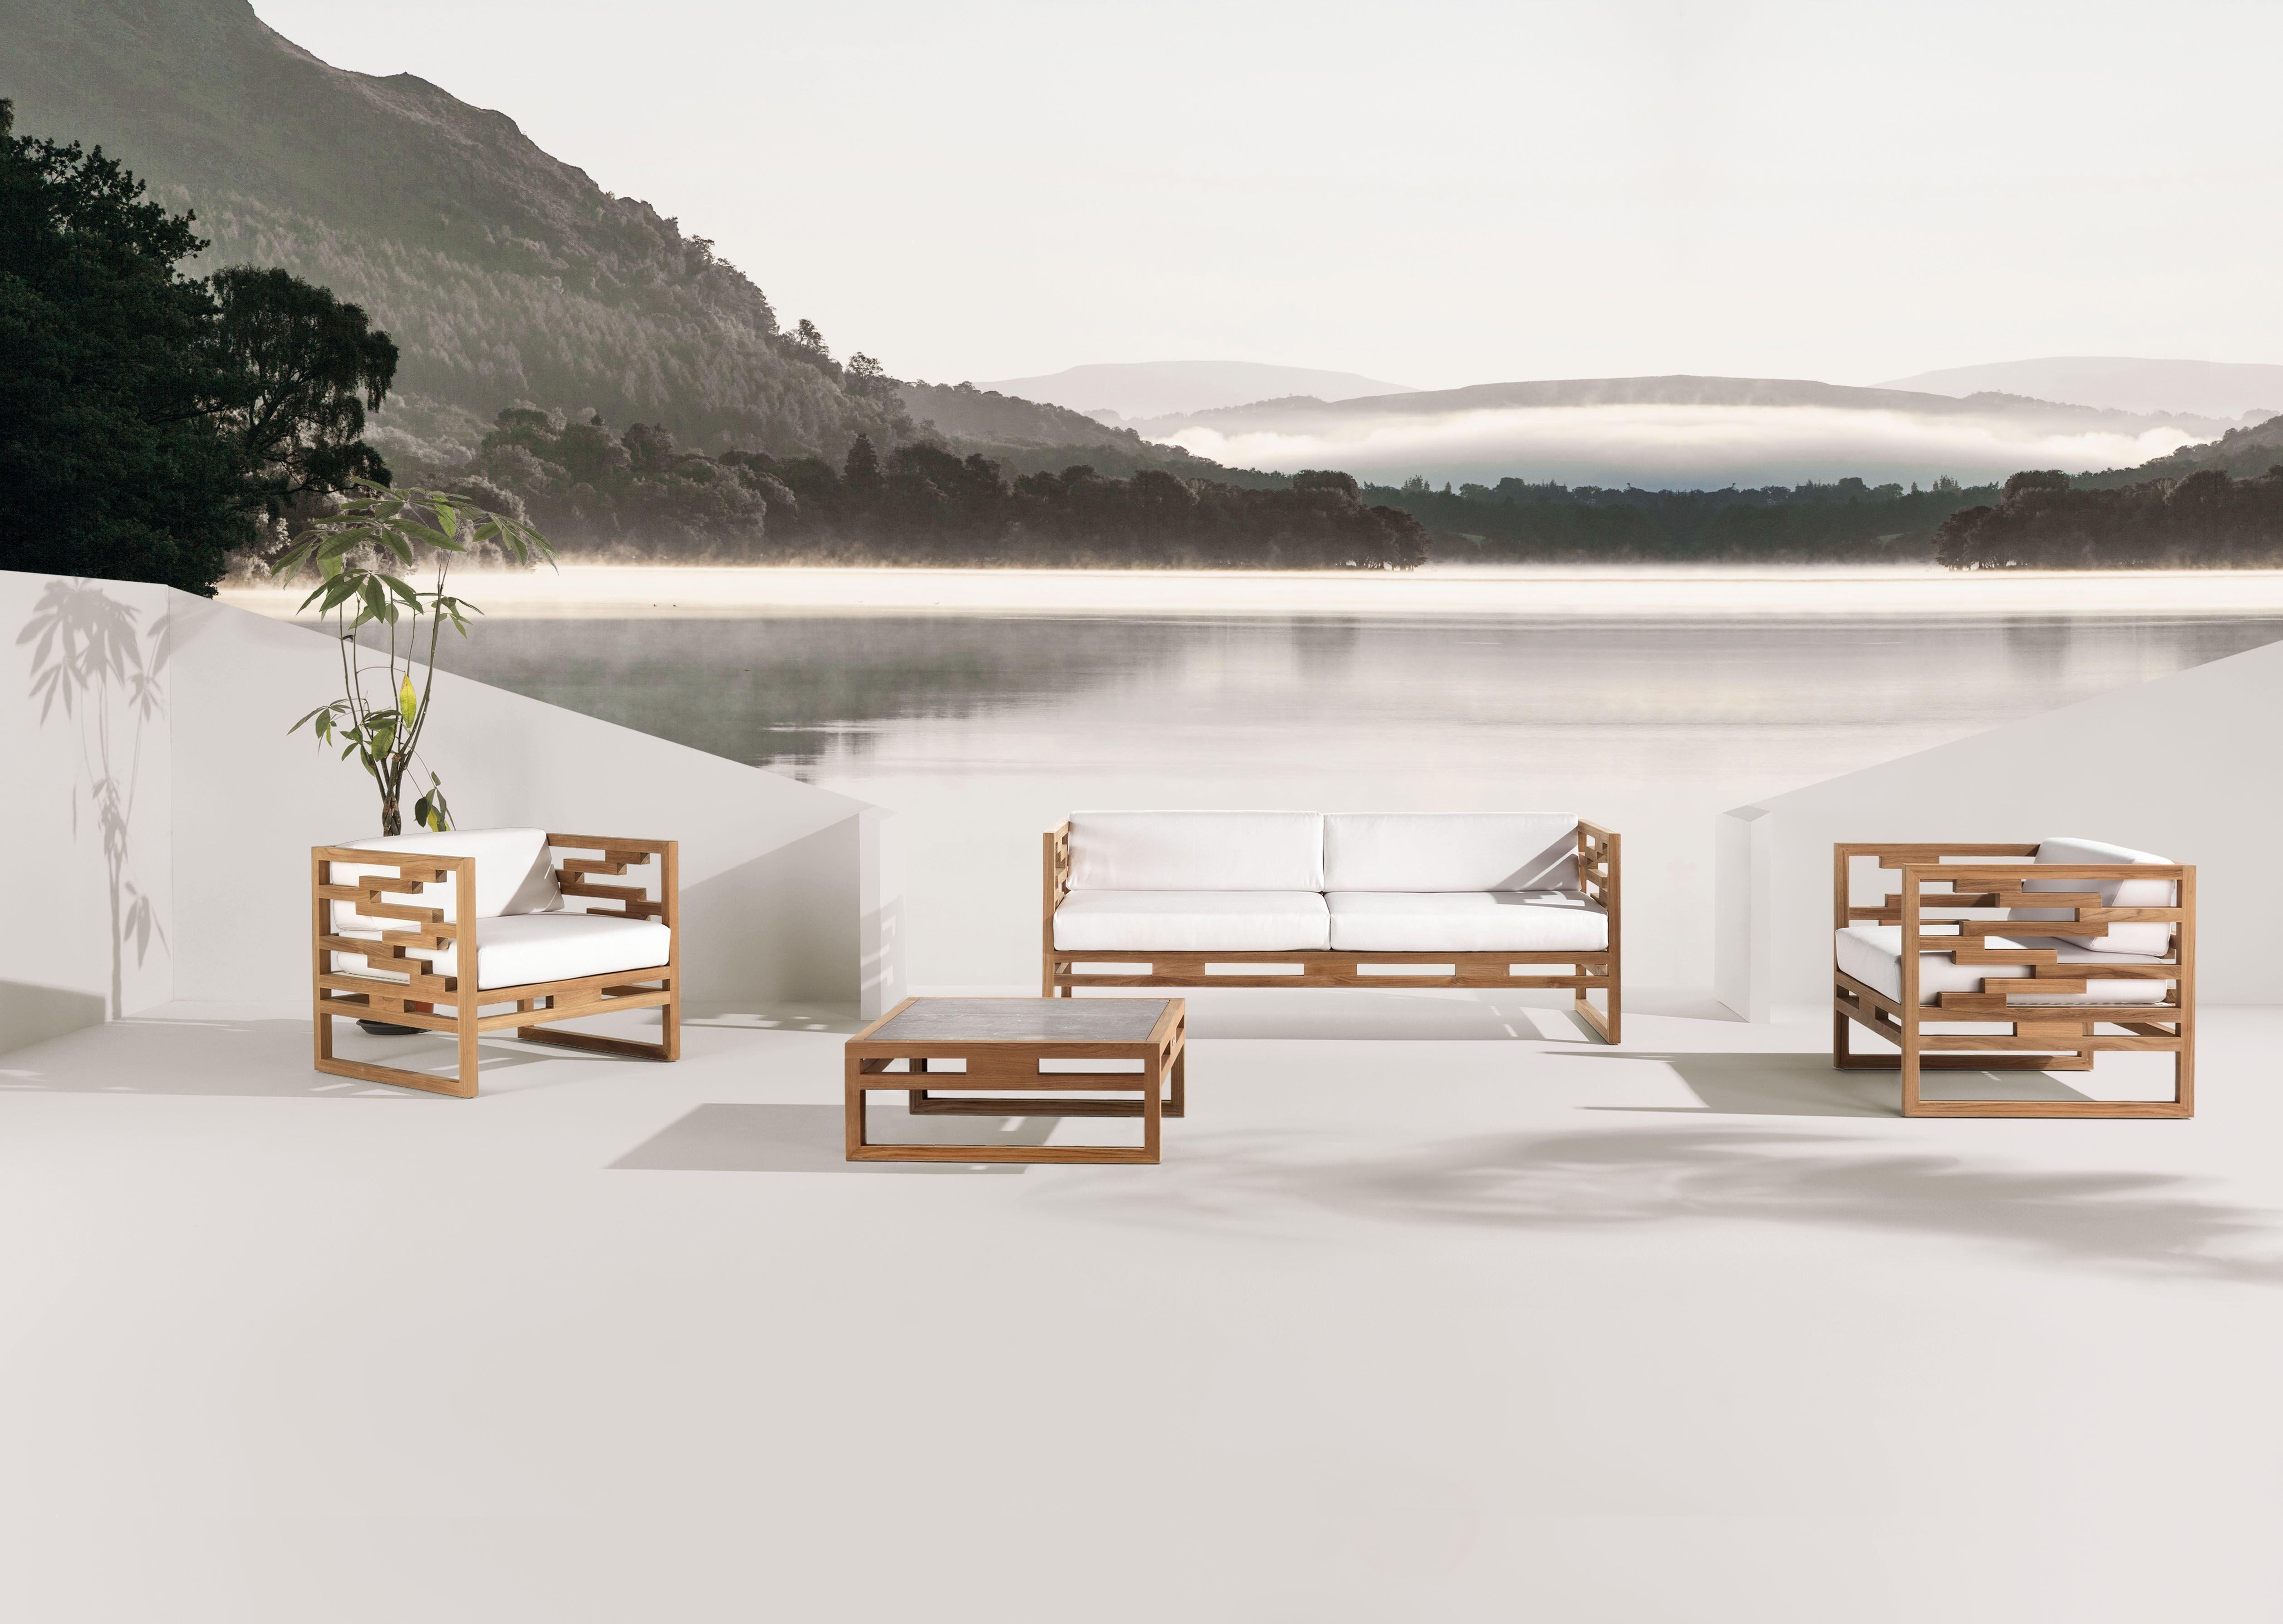 Salon de jardin Kontiki chez Emu : Salon de jardin : 20 ...